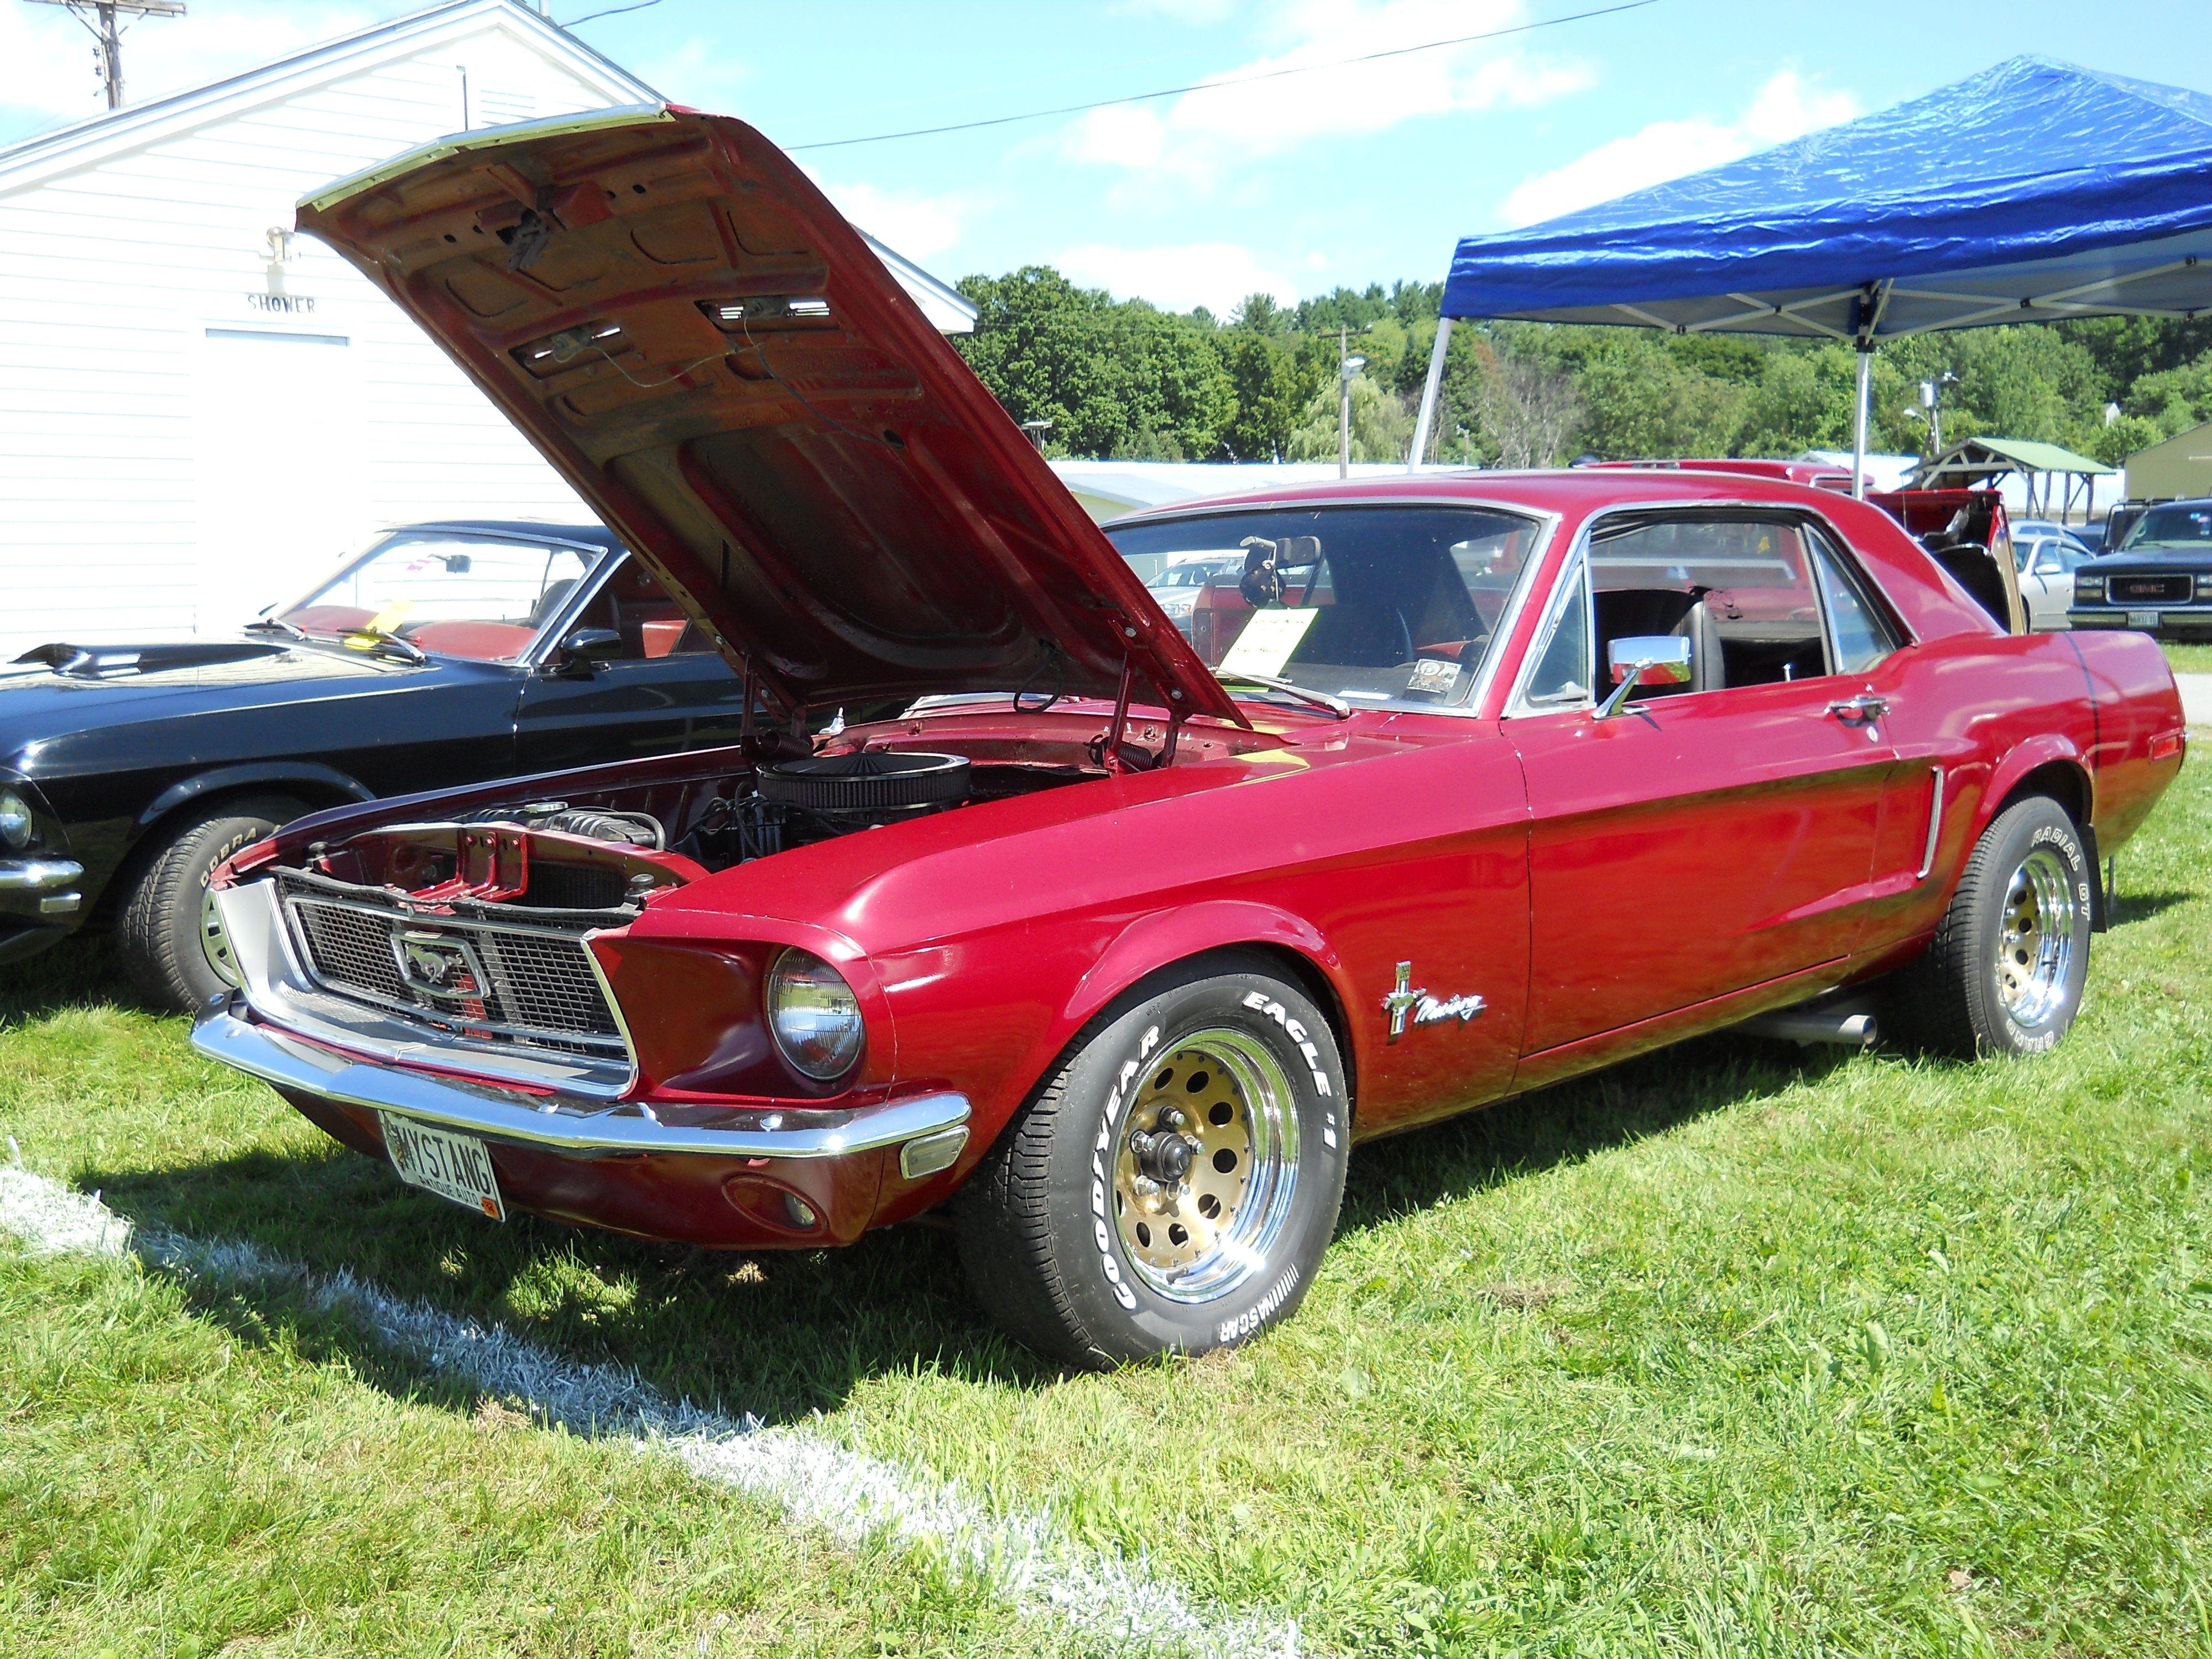 1968 Ford Mustang Car